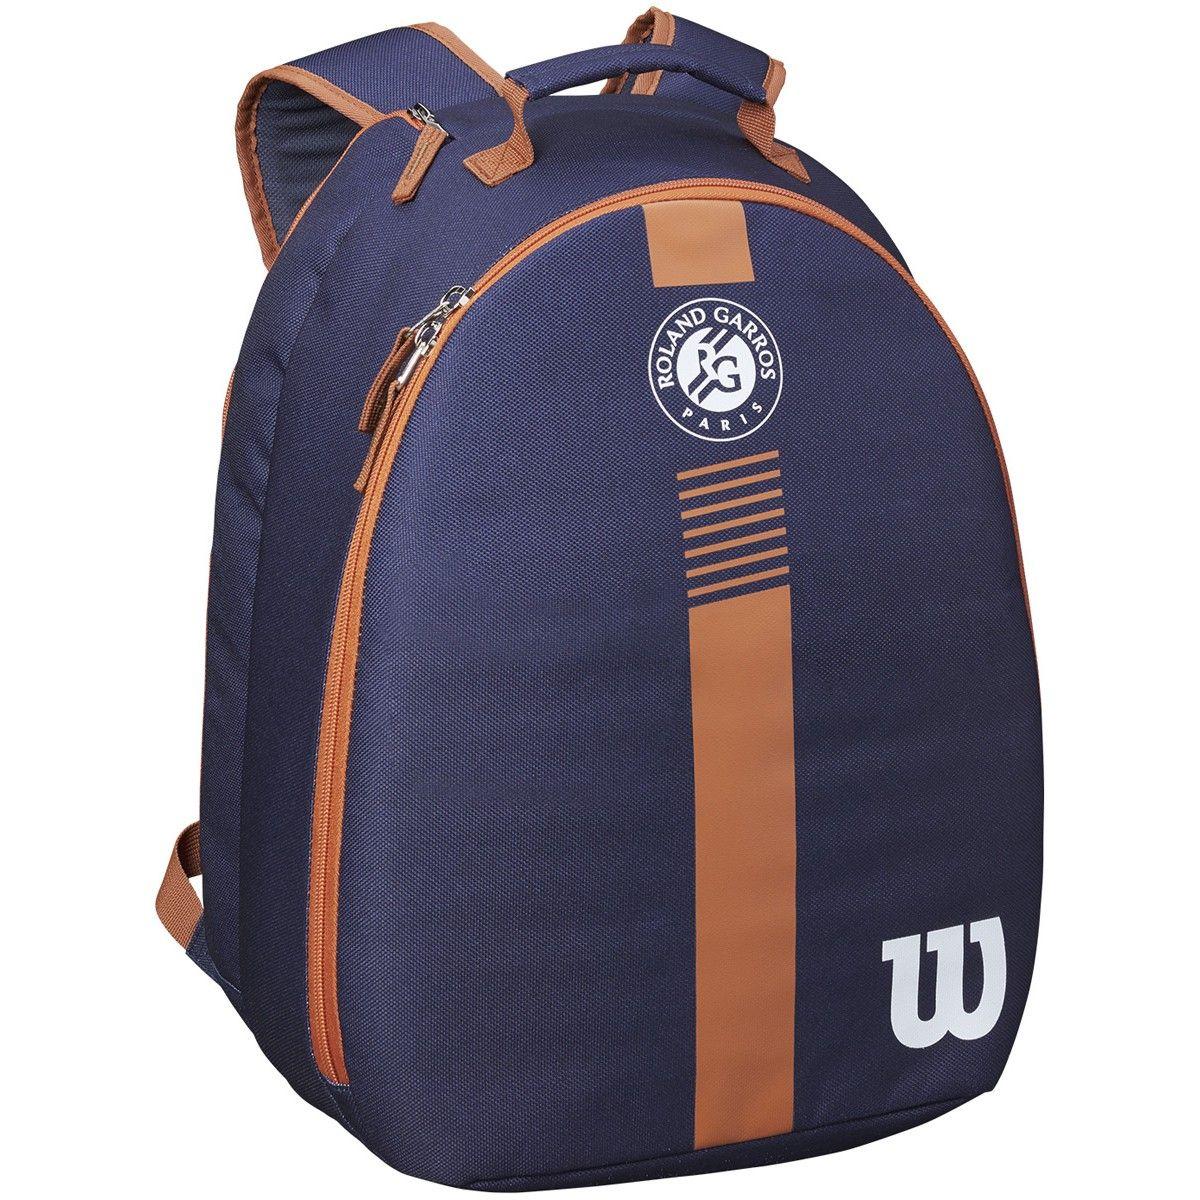 backpack-rg-jr-2